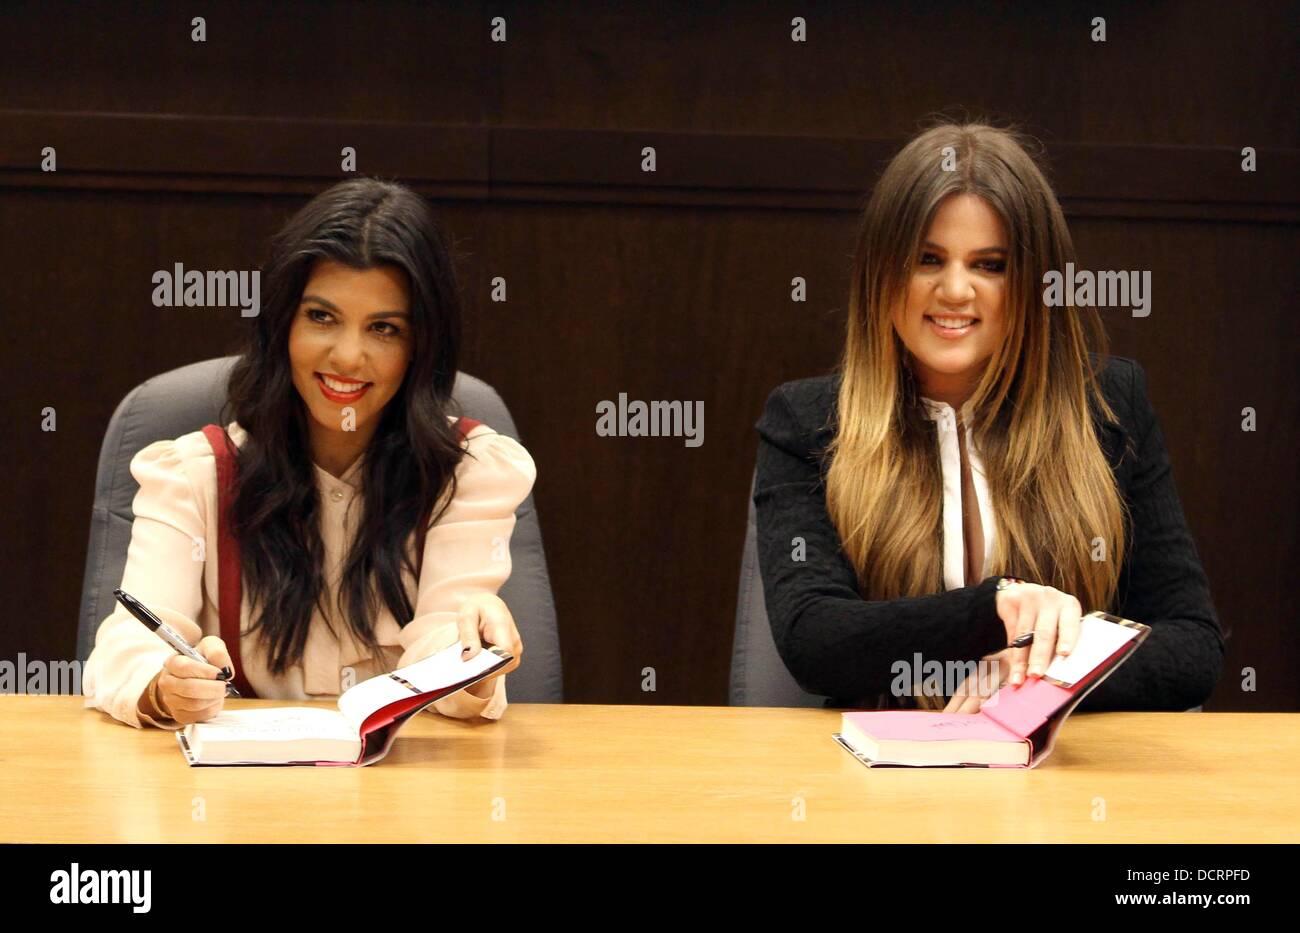 Khloe Kardashian And Kourtney Kardashian Sign Copies Of Their New